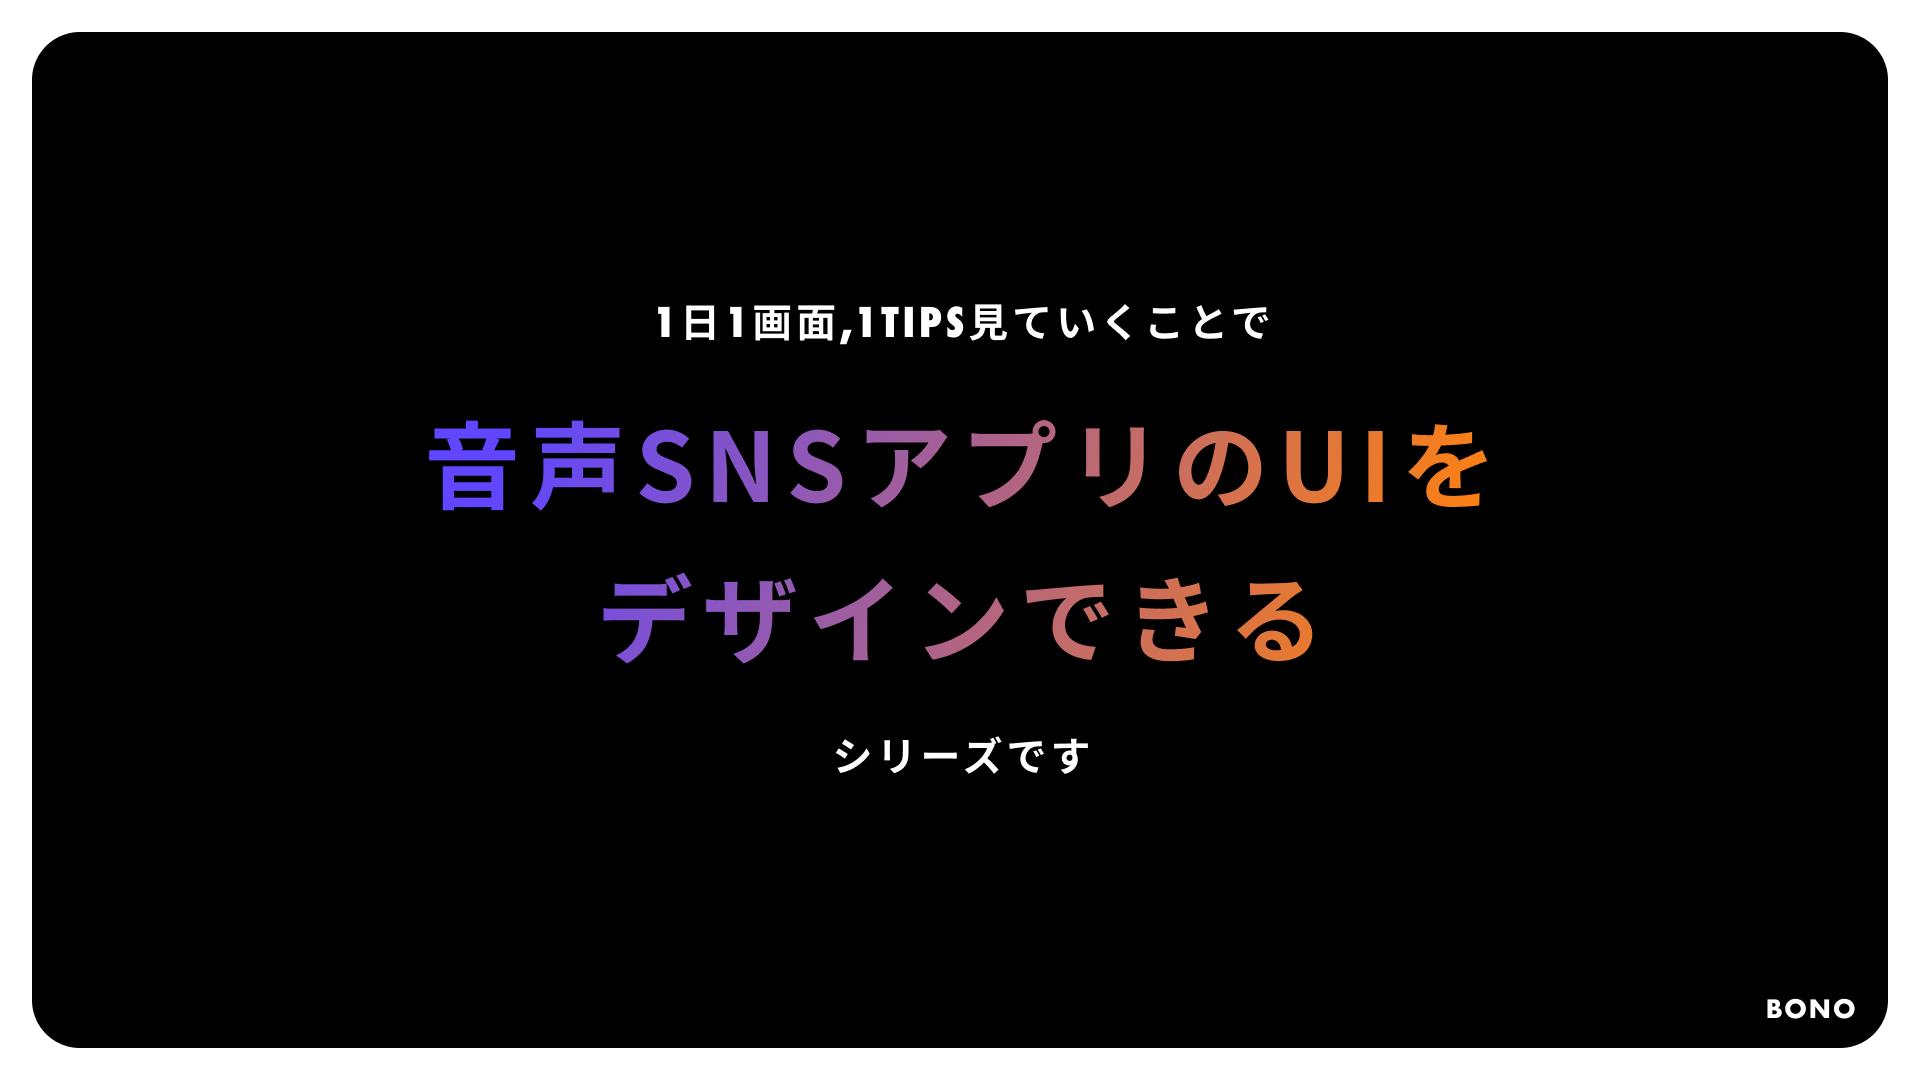 【Daily音声SNS】00シリーズの紹介